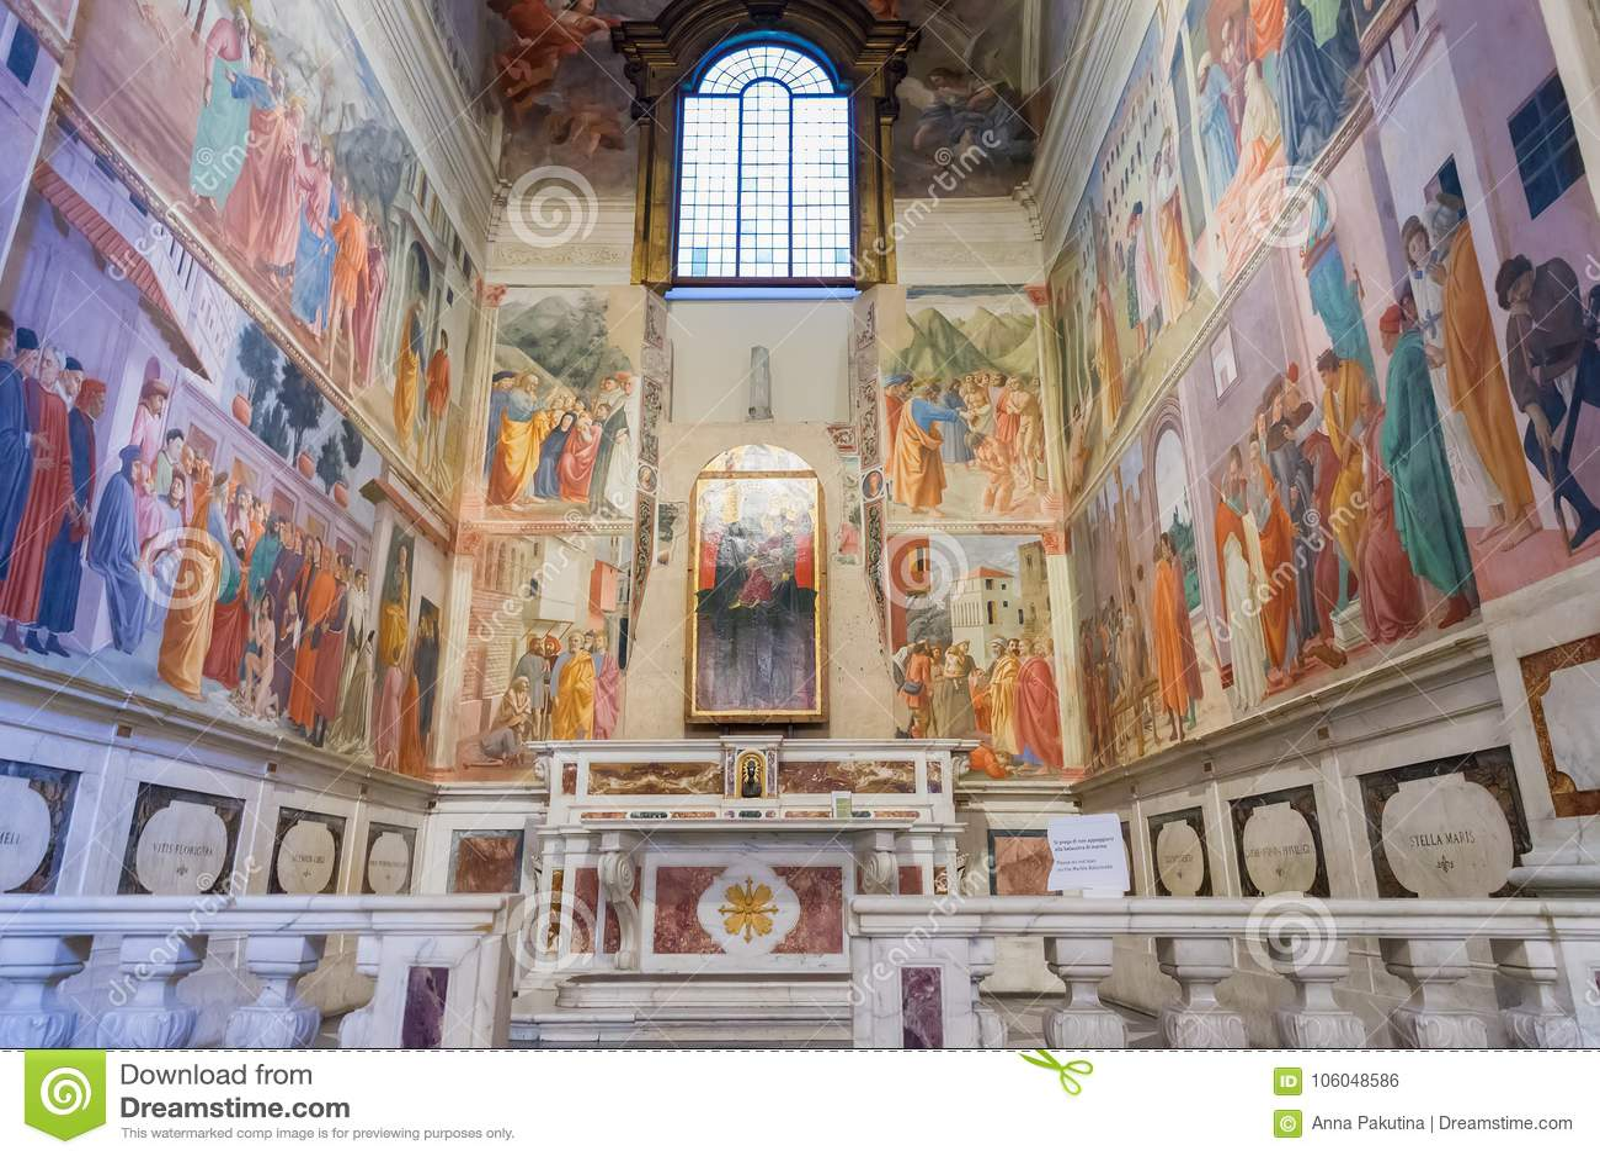 brancacci chapel in santa maria del The brancacci family owned the chapel in one of the transepts of santa maria del carmine since the 14th century, when it was founded by pietro di piuvichese brancacci (1367.